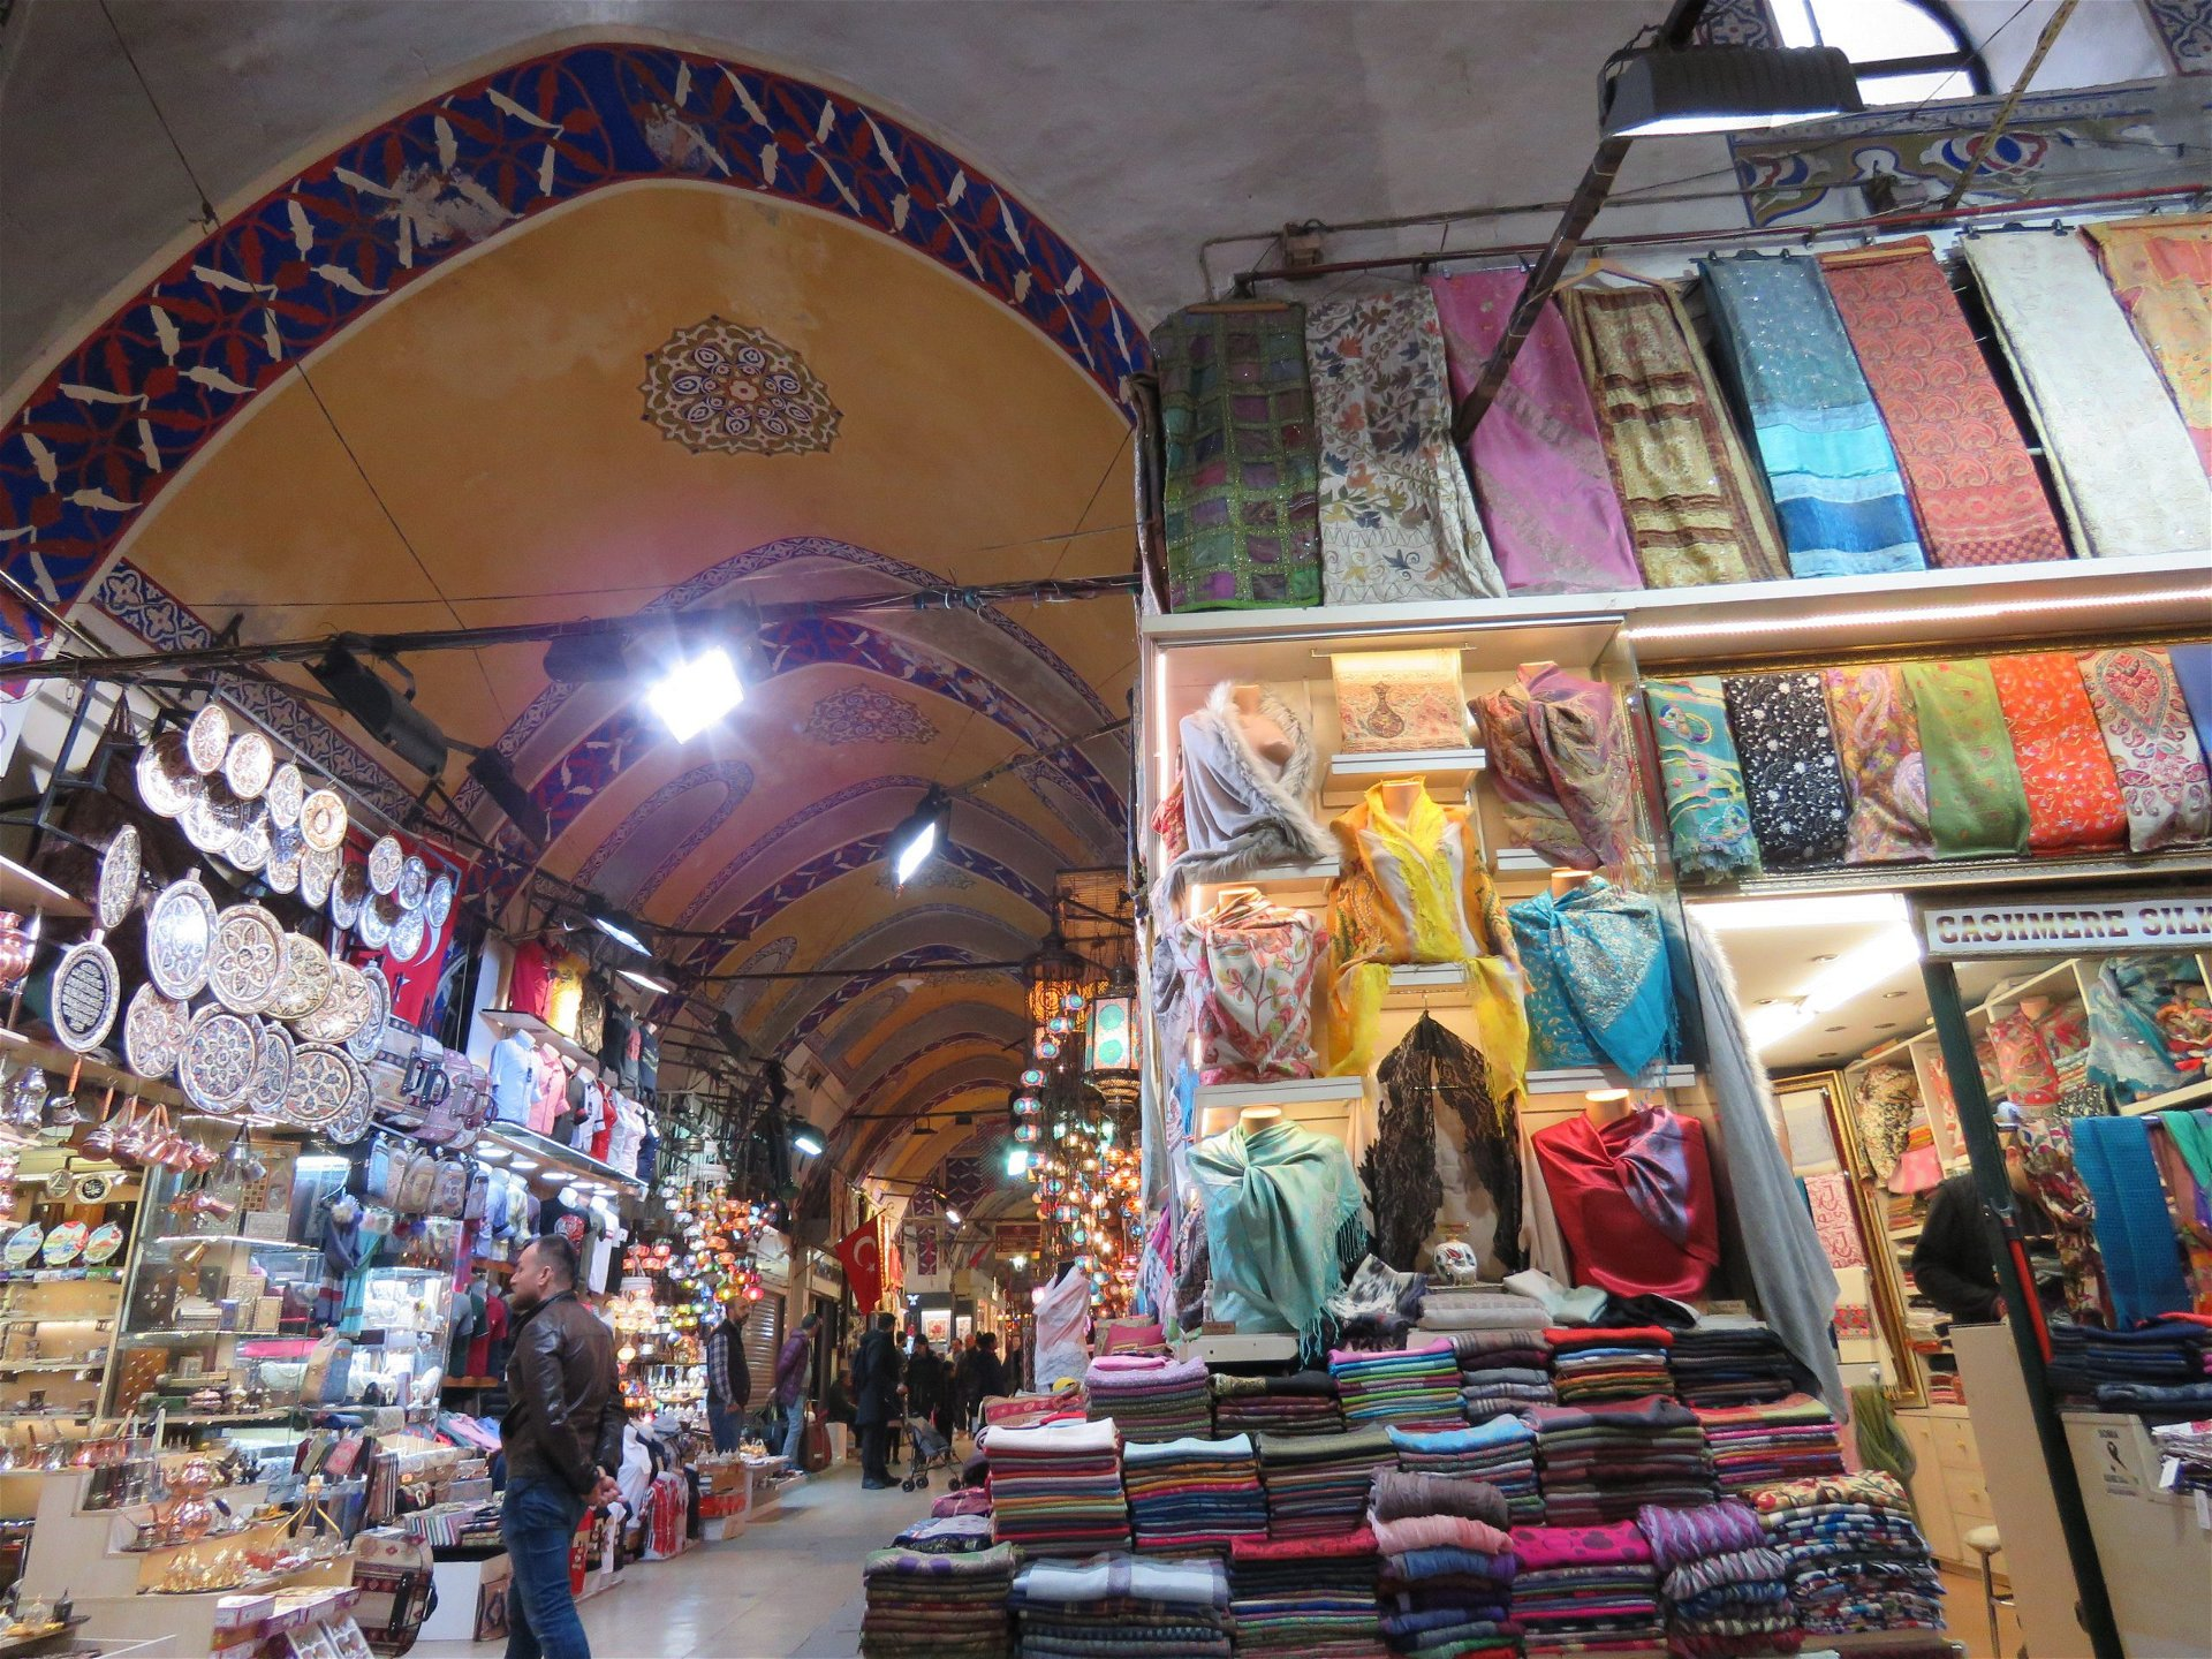 marchés bazar istanbul turquie shopping